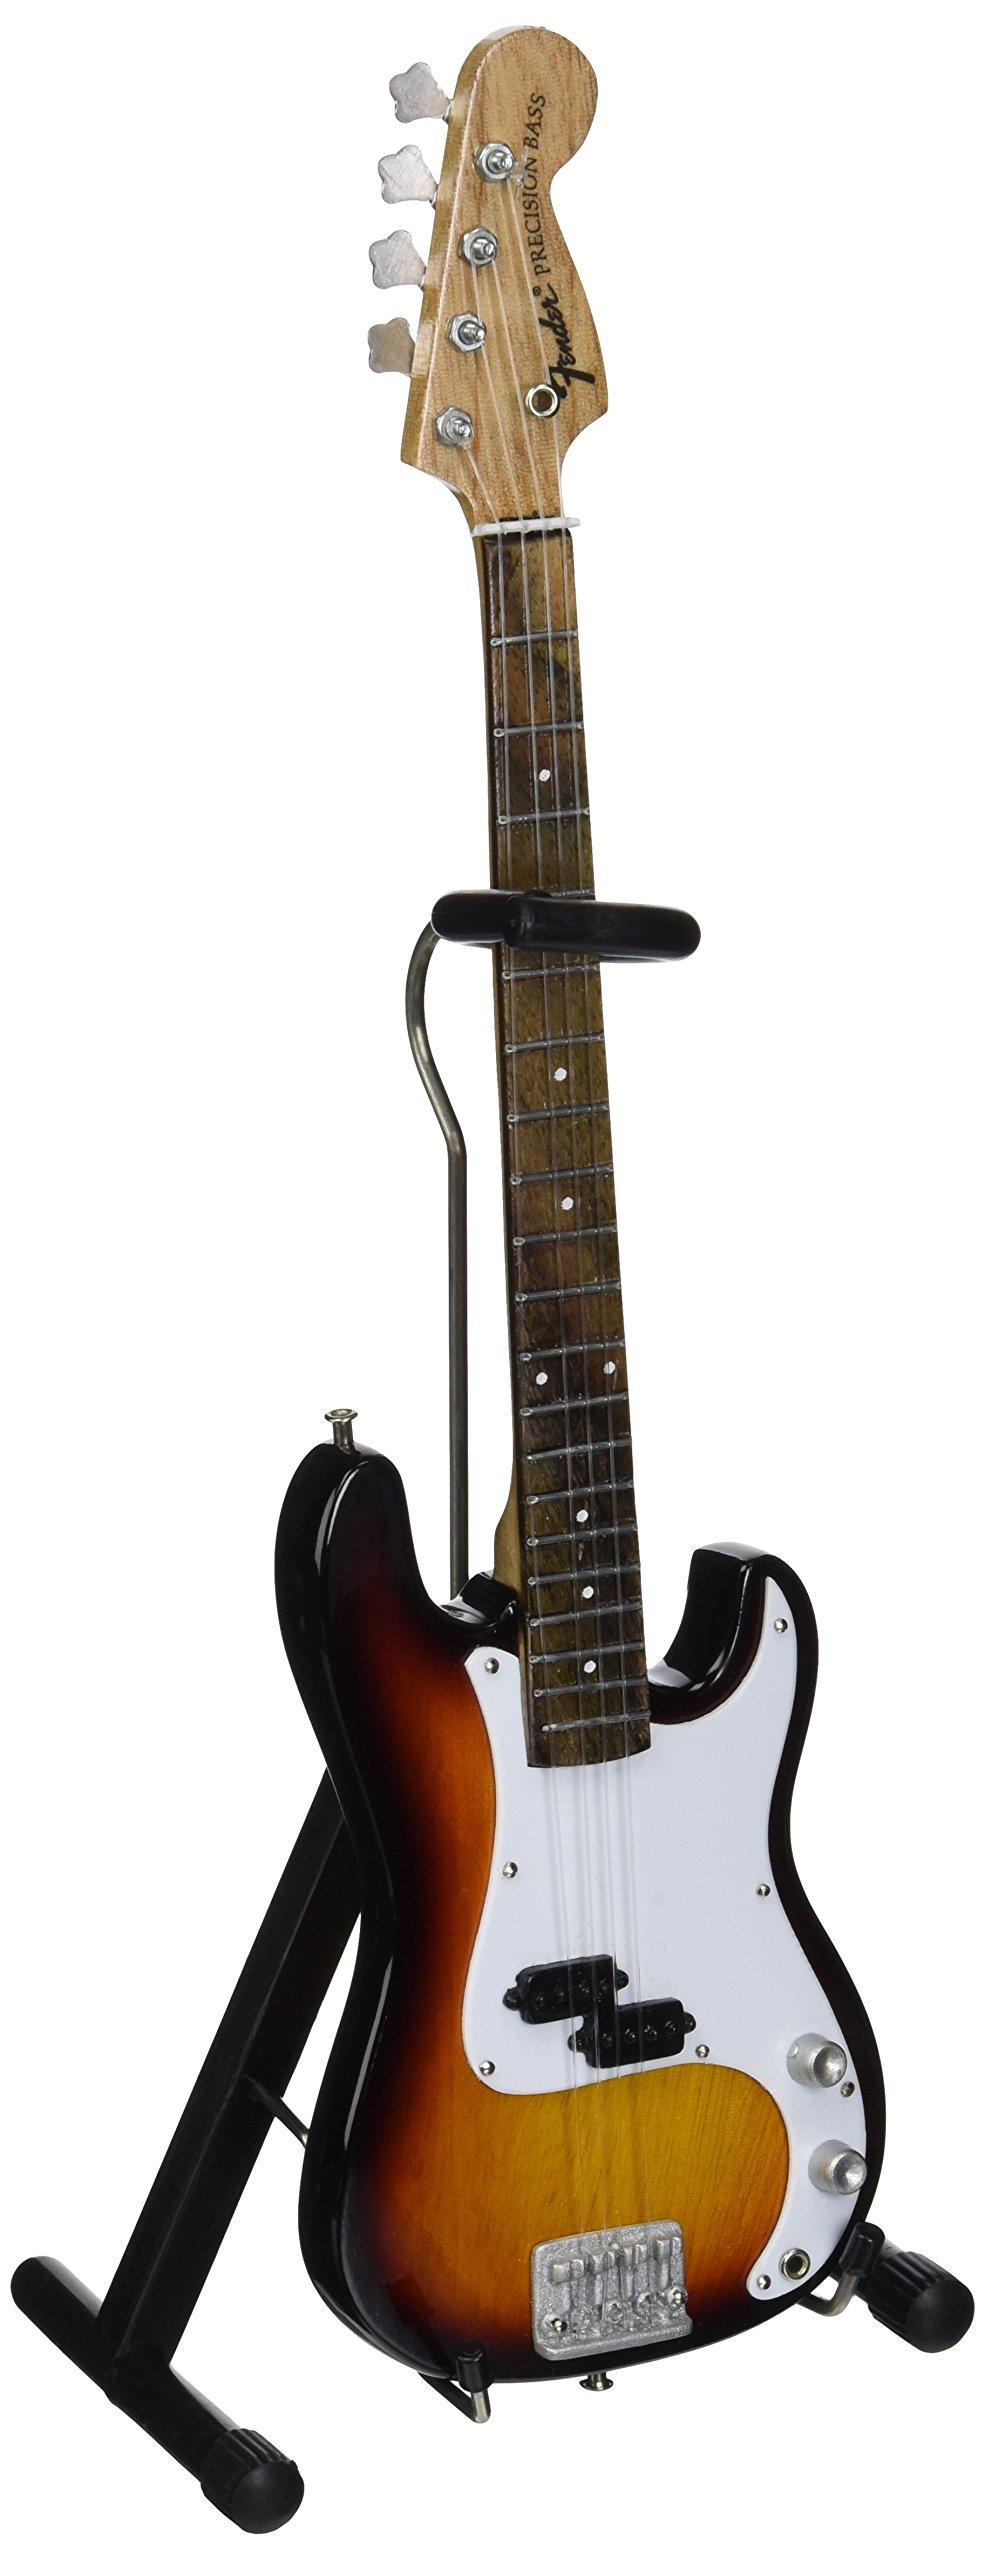 Axe Heaven FP-001 Fender Precision Bass Sunburst Miniature Guitar Replica